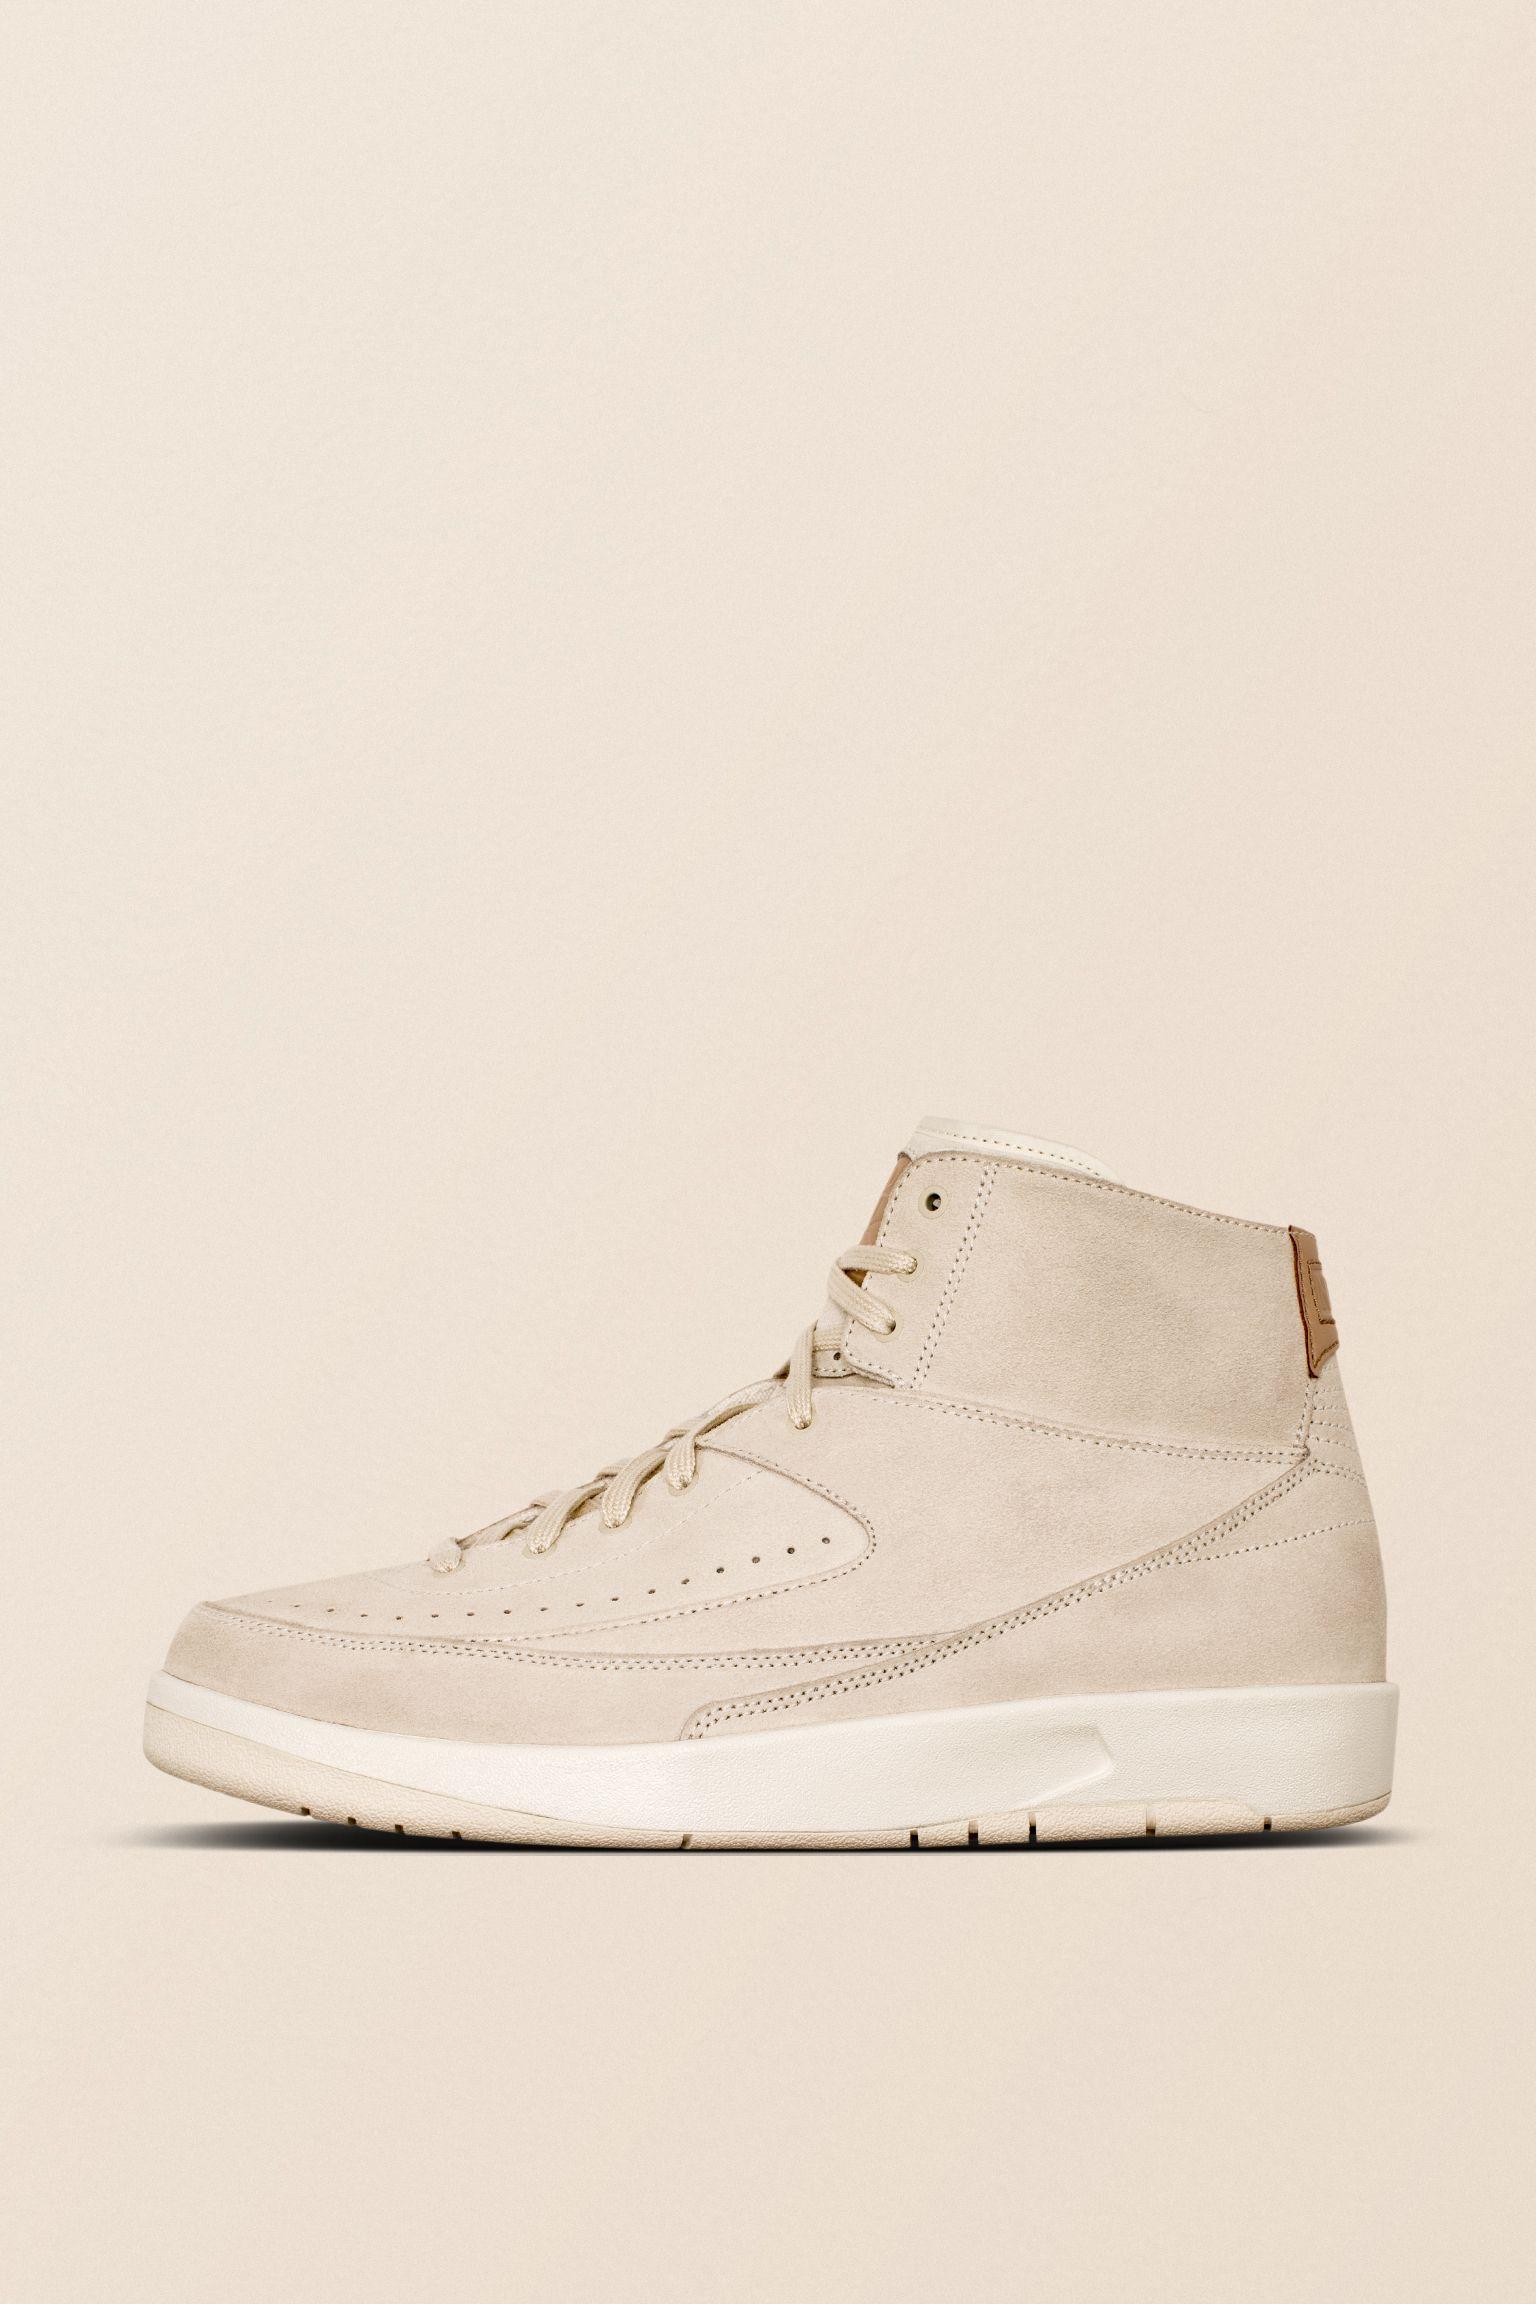 c1cfafea07e AIR JORDAN II DECON | Things to Wear | Jordans, Air jordans, Nike ...